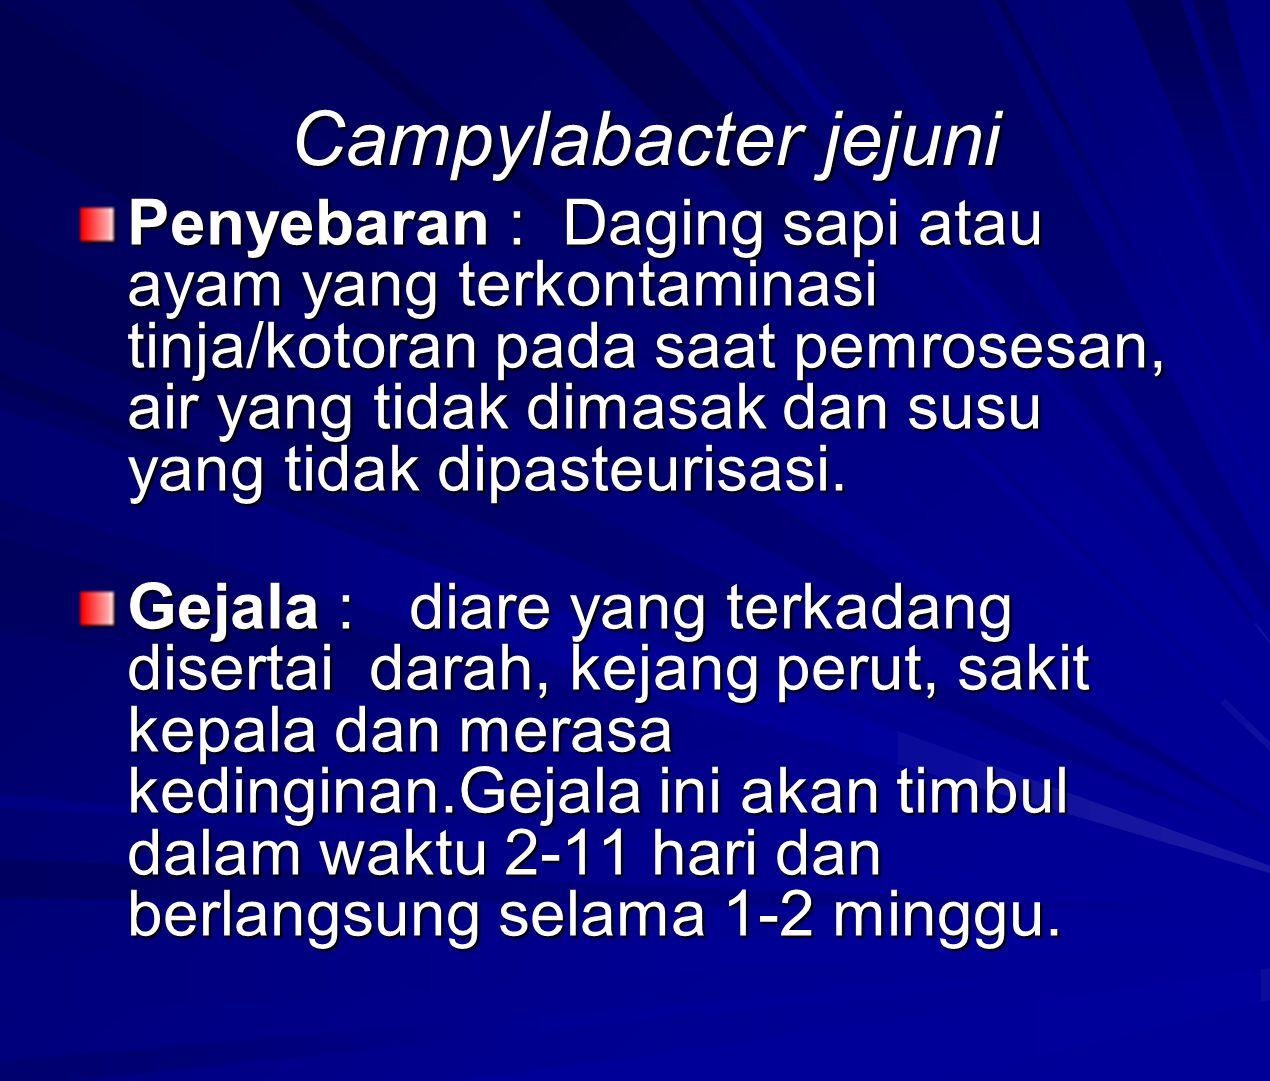 Campylabacter jejuni